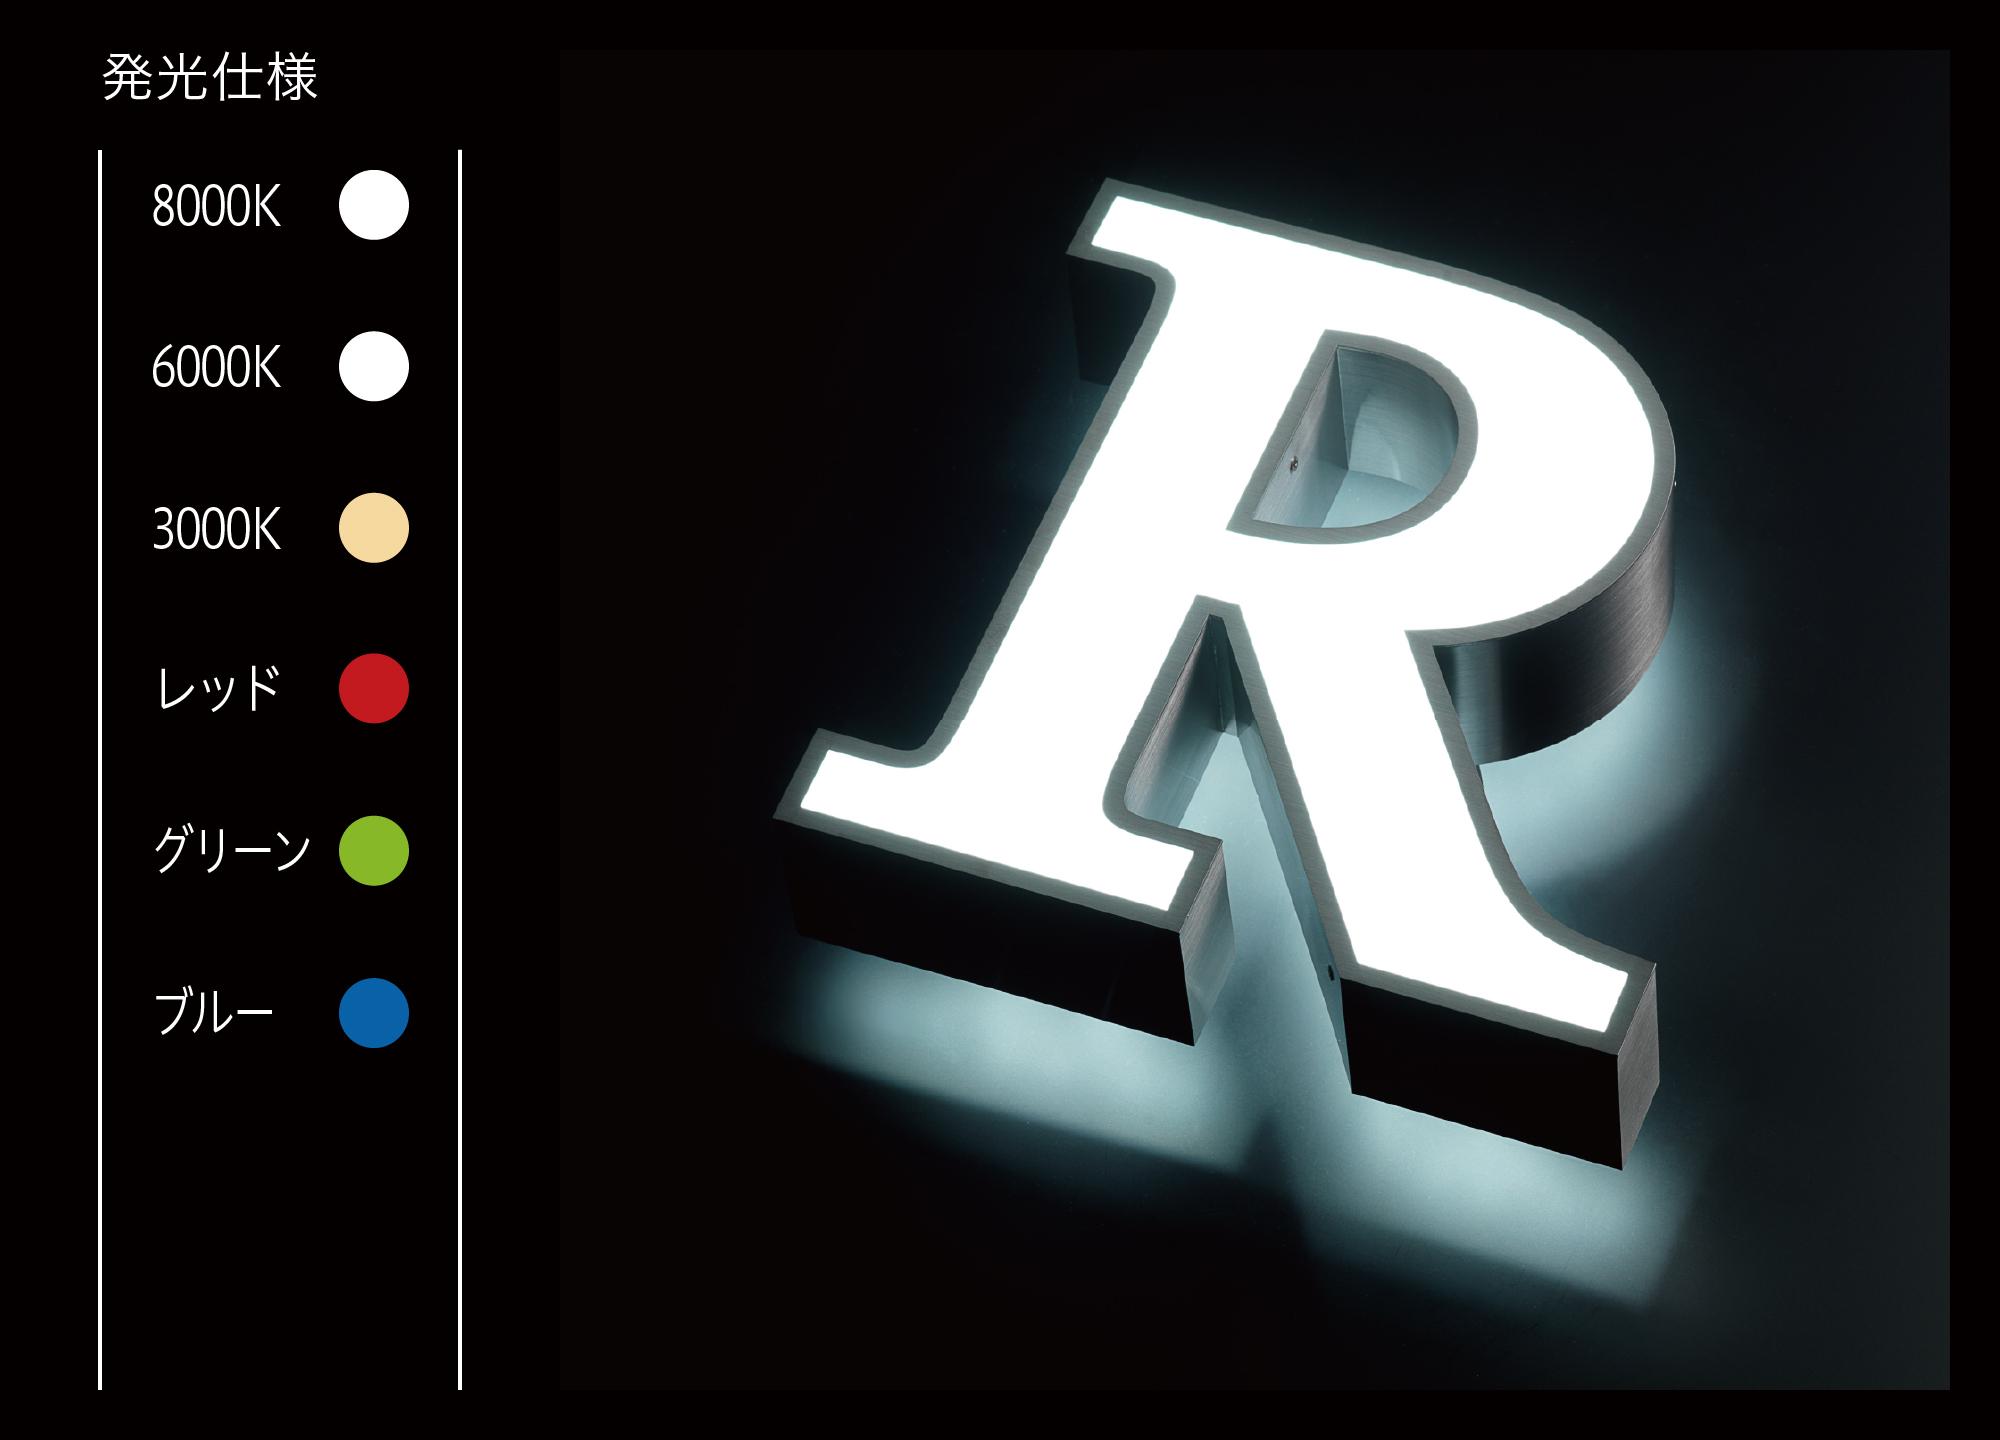 LEDサイン、LED看板のLEDIUS SIGN PRO FRONT BACK CHANNEL